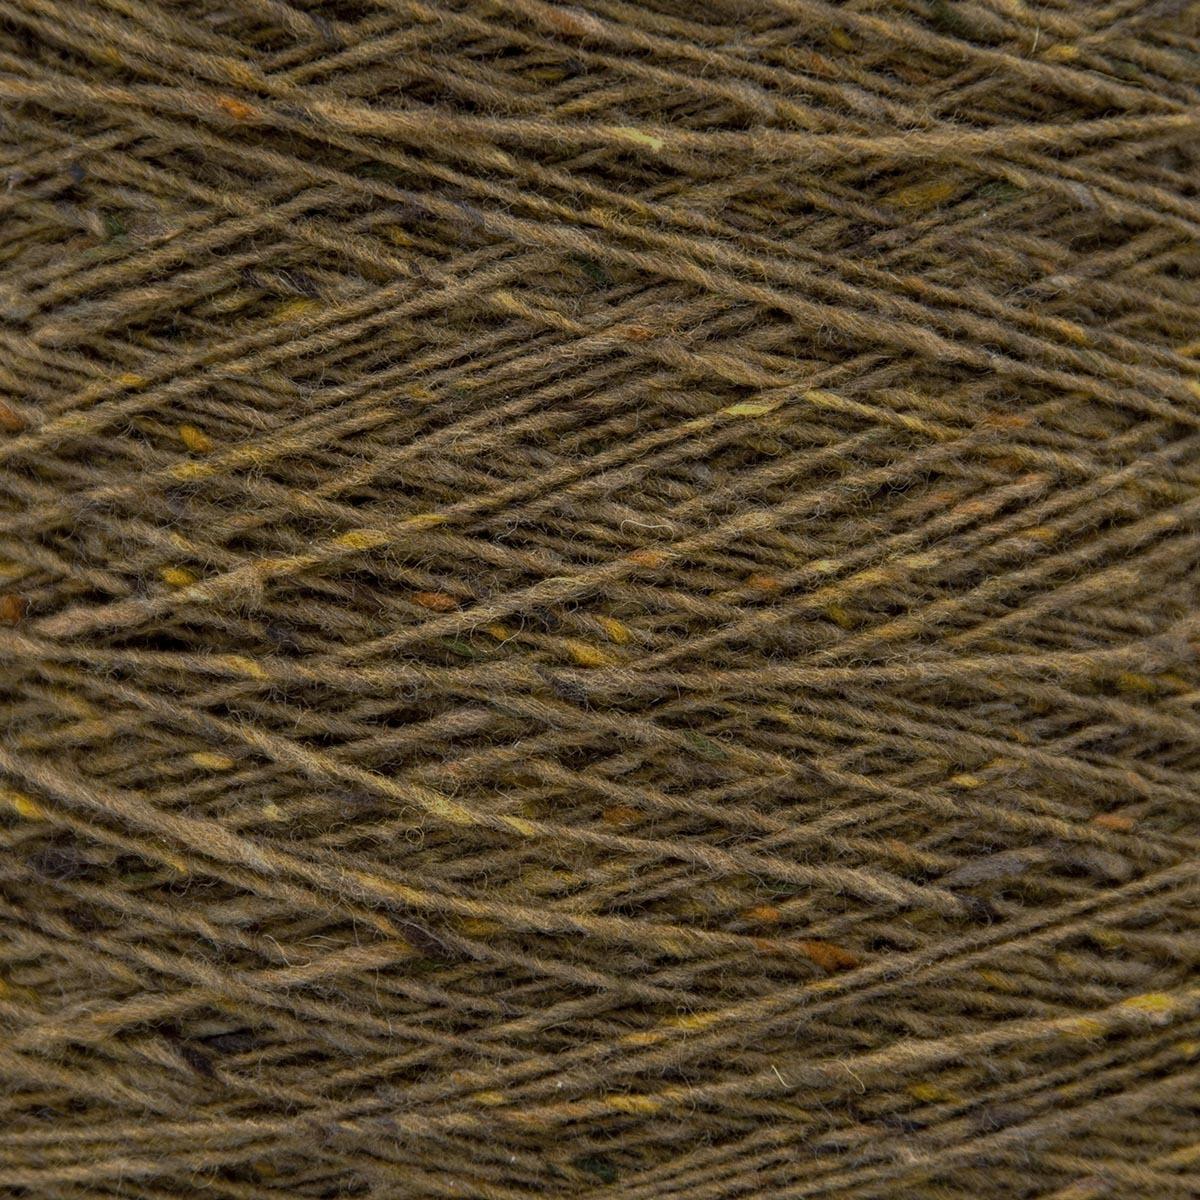 Knoll Yarns Soft Donegal (одинарный твид) - 5587